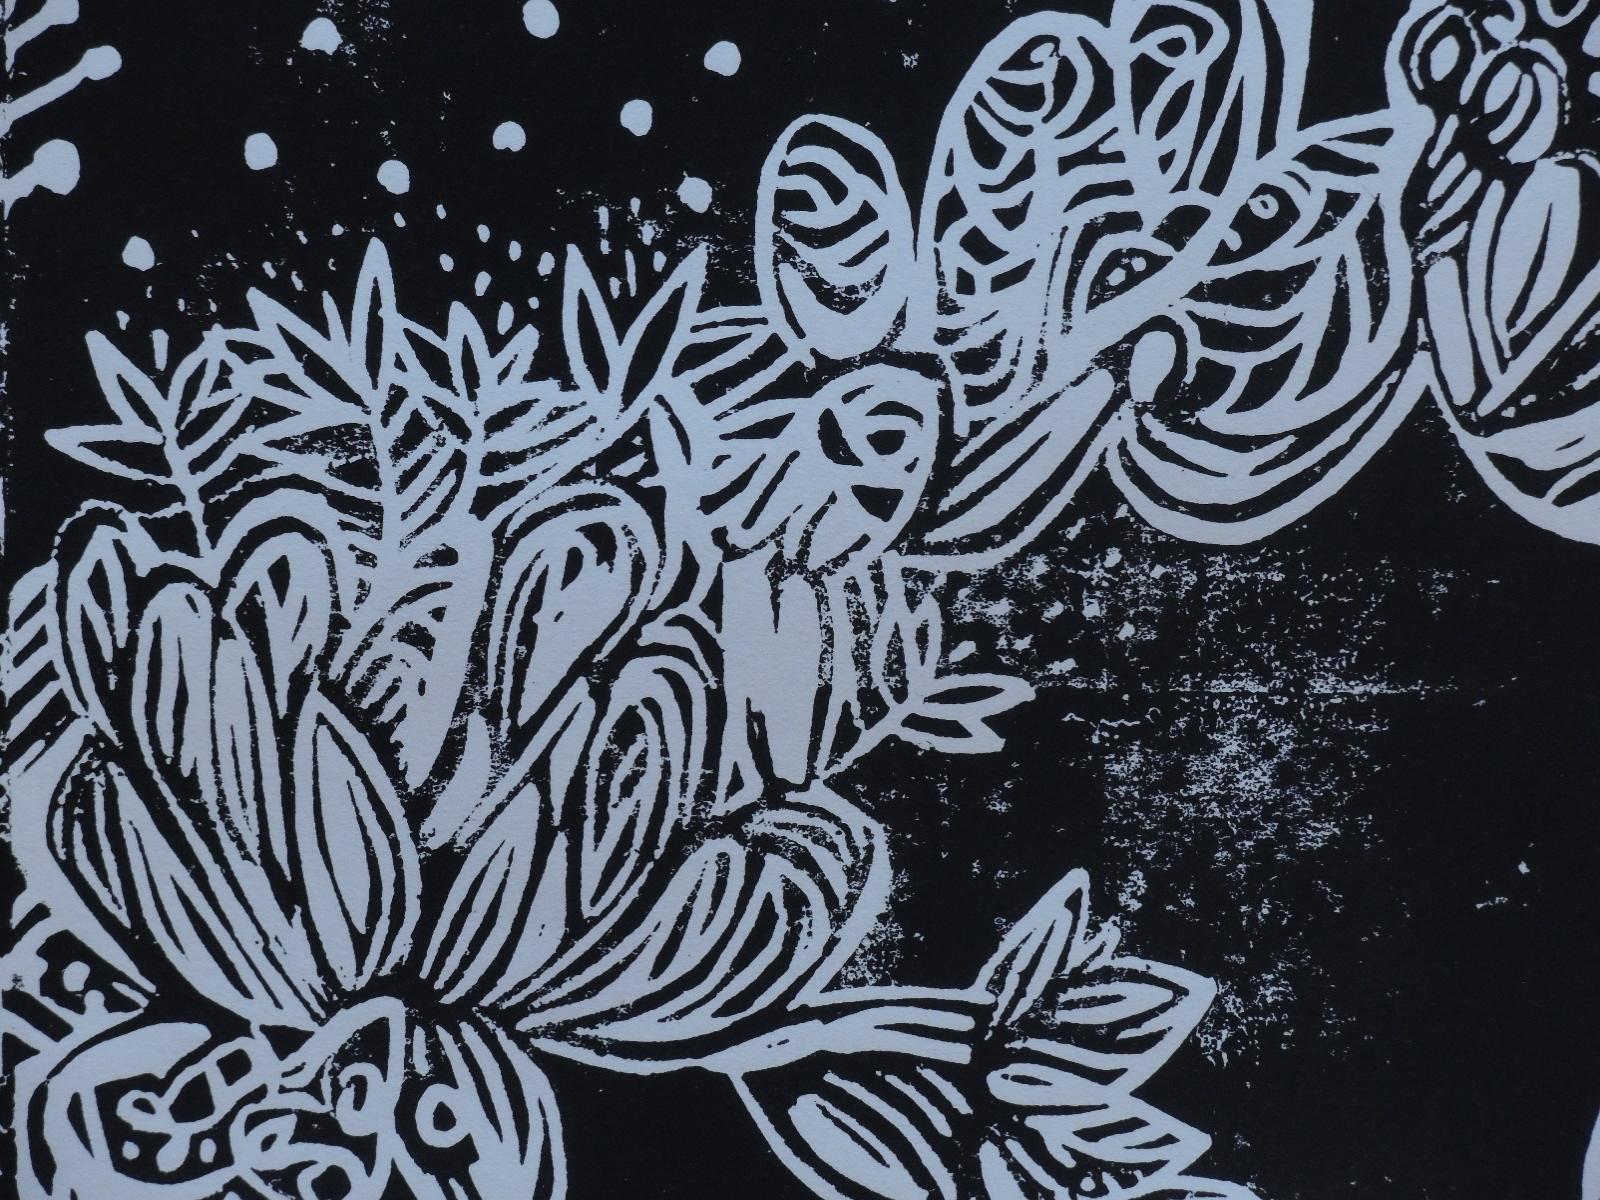 Linoldruck, Lucia Jokiel